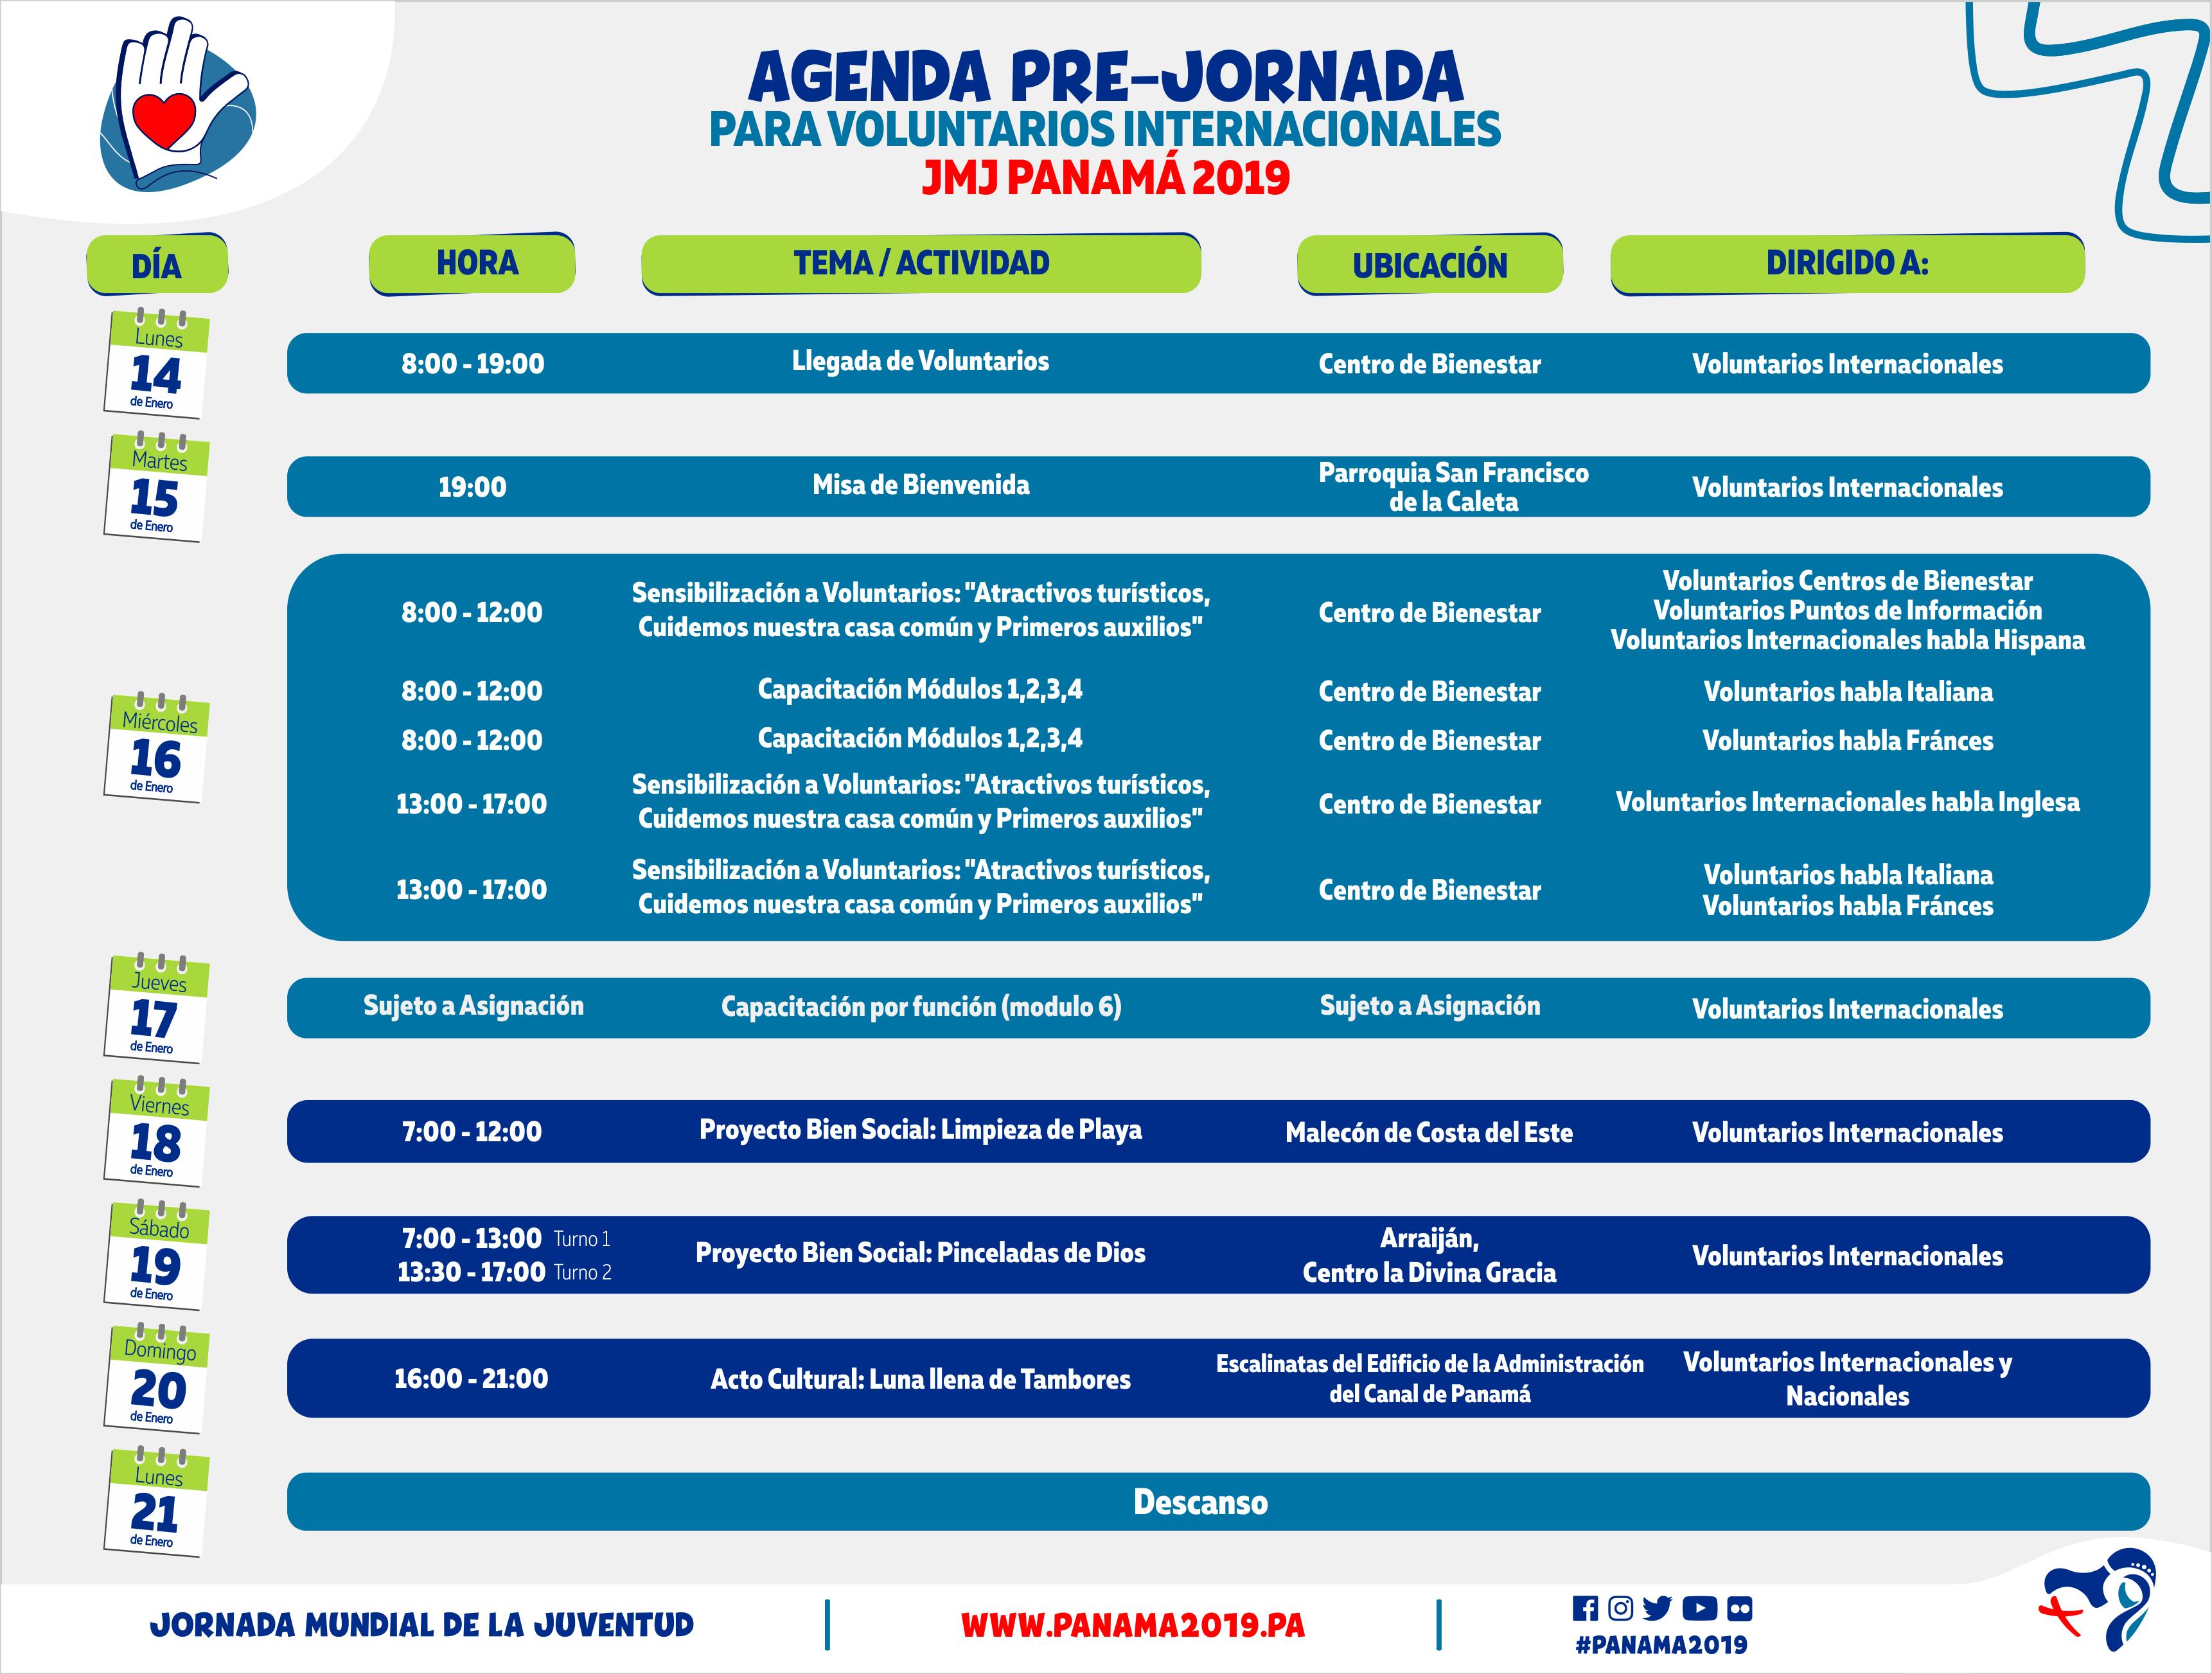 Agenda Pre-Jornada final